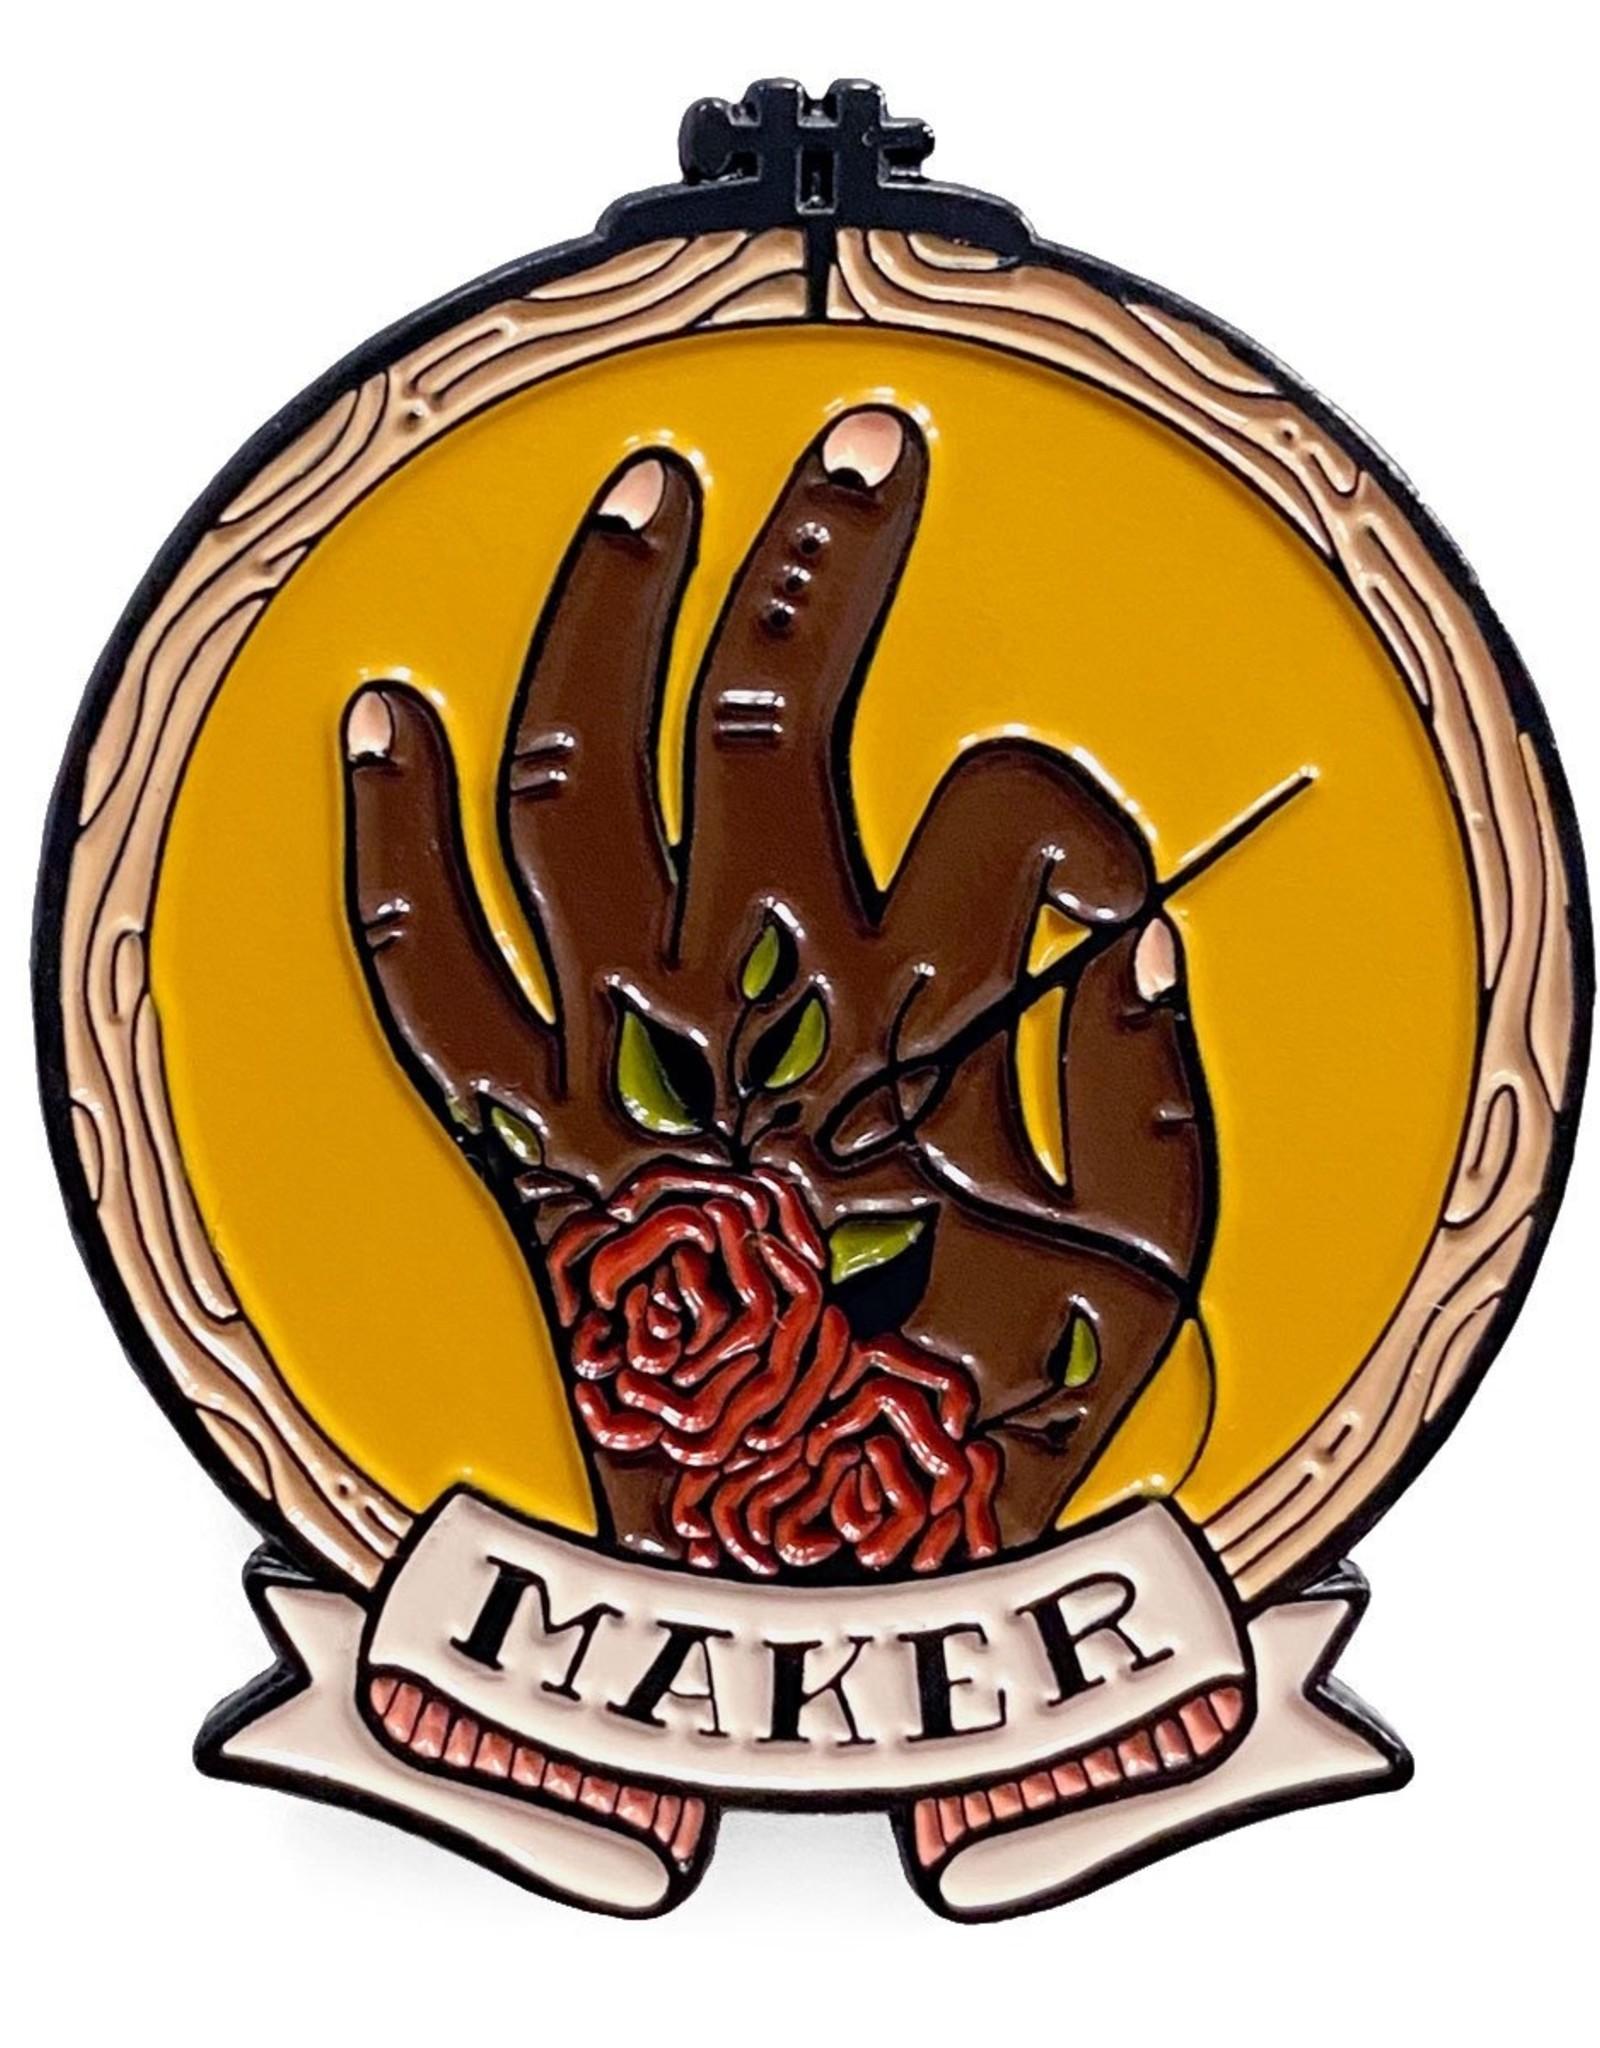 Shelli.can Shelli.Can Stitch Maker Pin Mustard